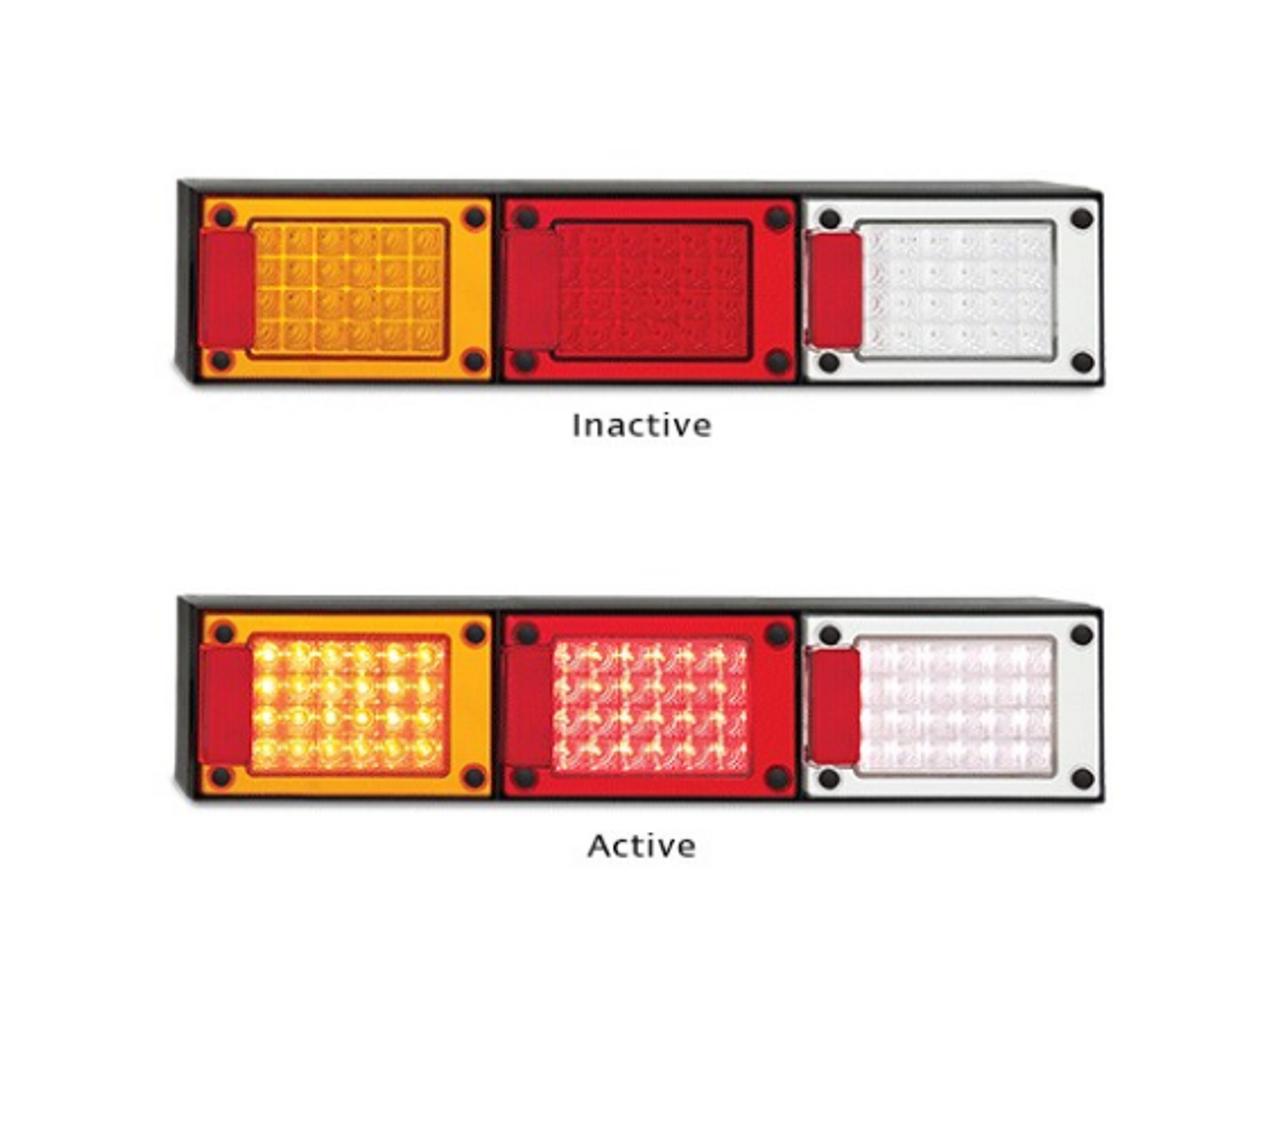 AL1729  J3BARWM Stop, Tail, Indicator, Reverse Light with Reflectors  Multivolt 12-24v Blister Single Pack - LED Auto Lamps J3BARWM